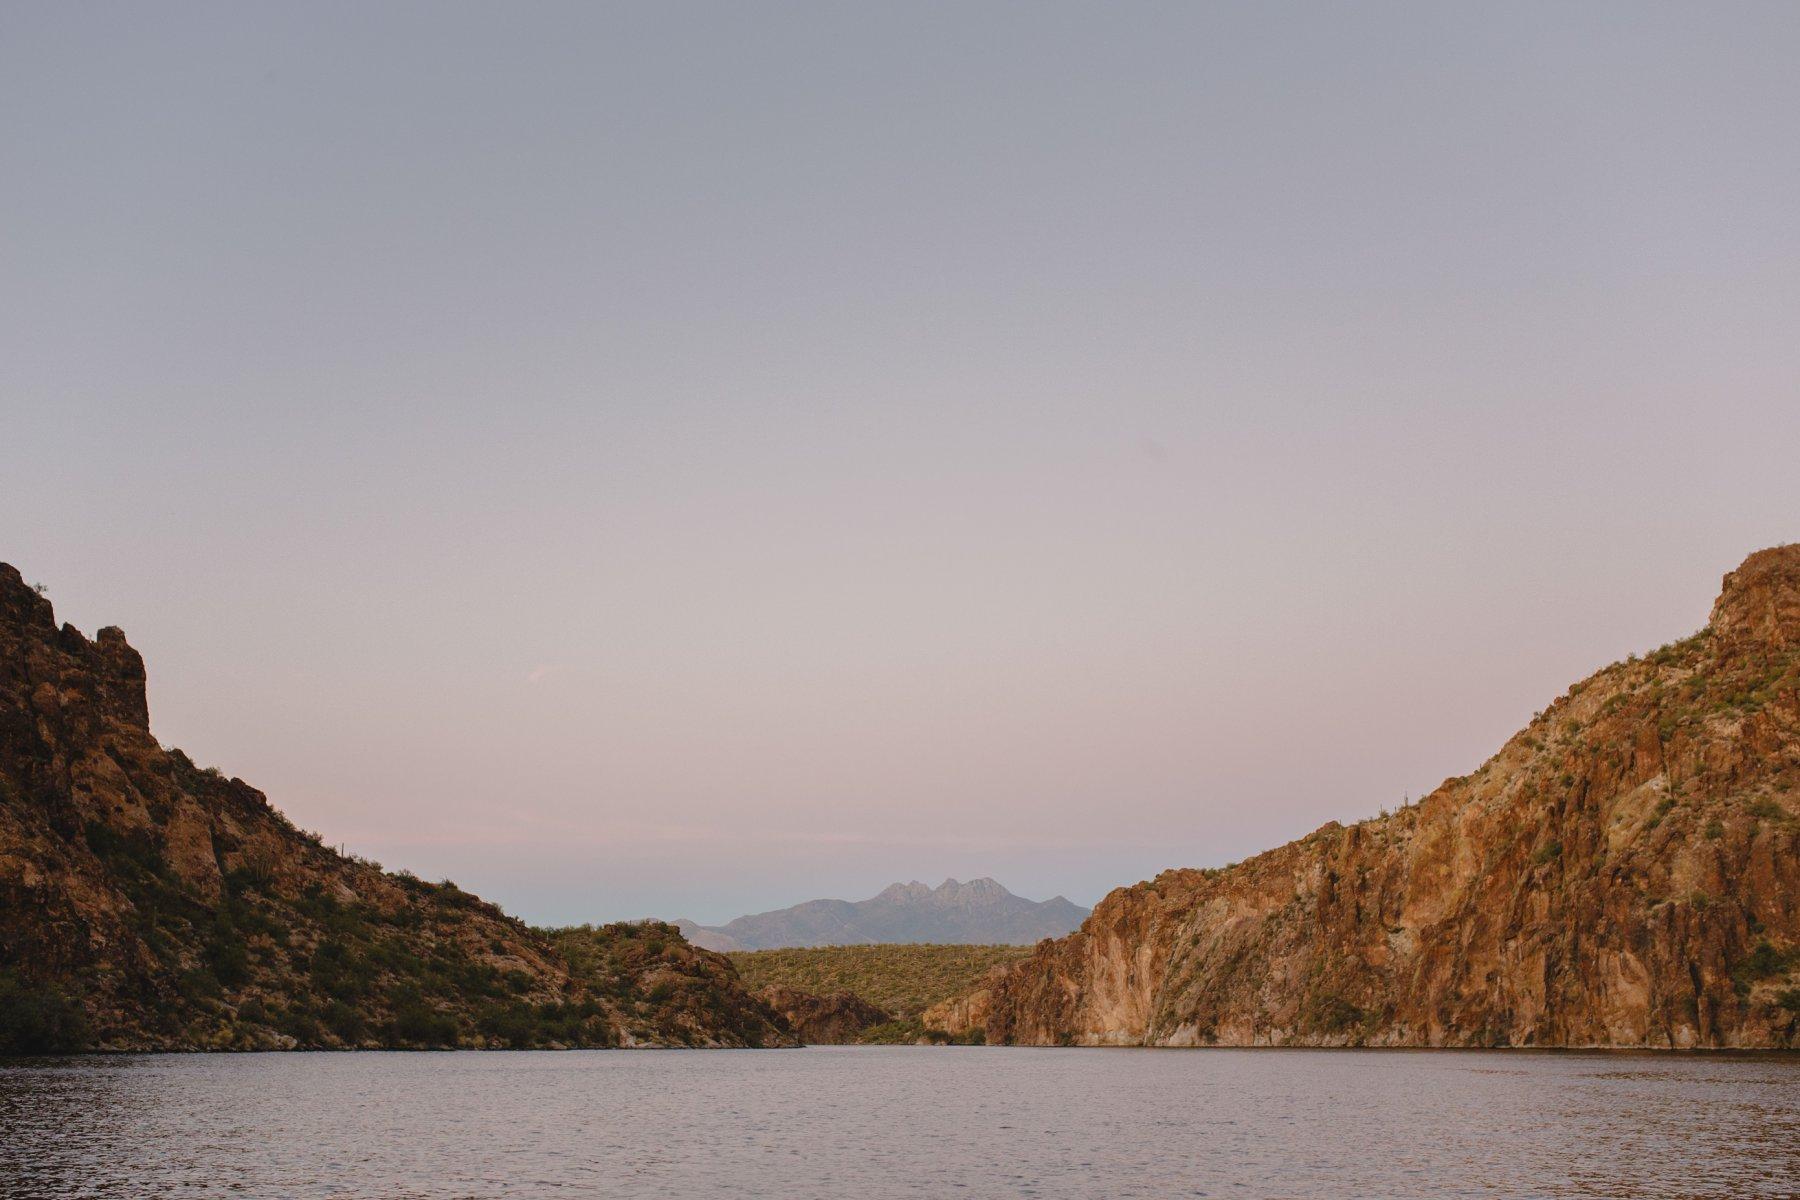 Four Peaks and Saguaro Lake at sunset